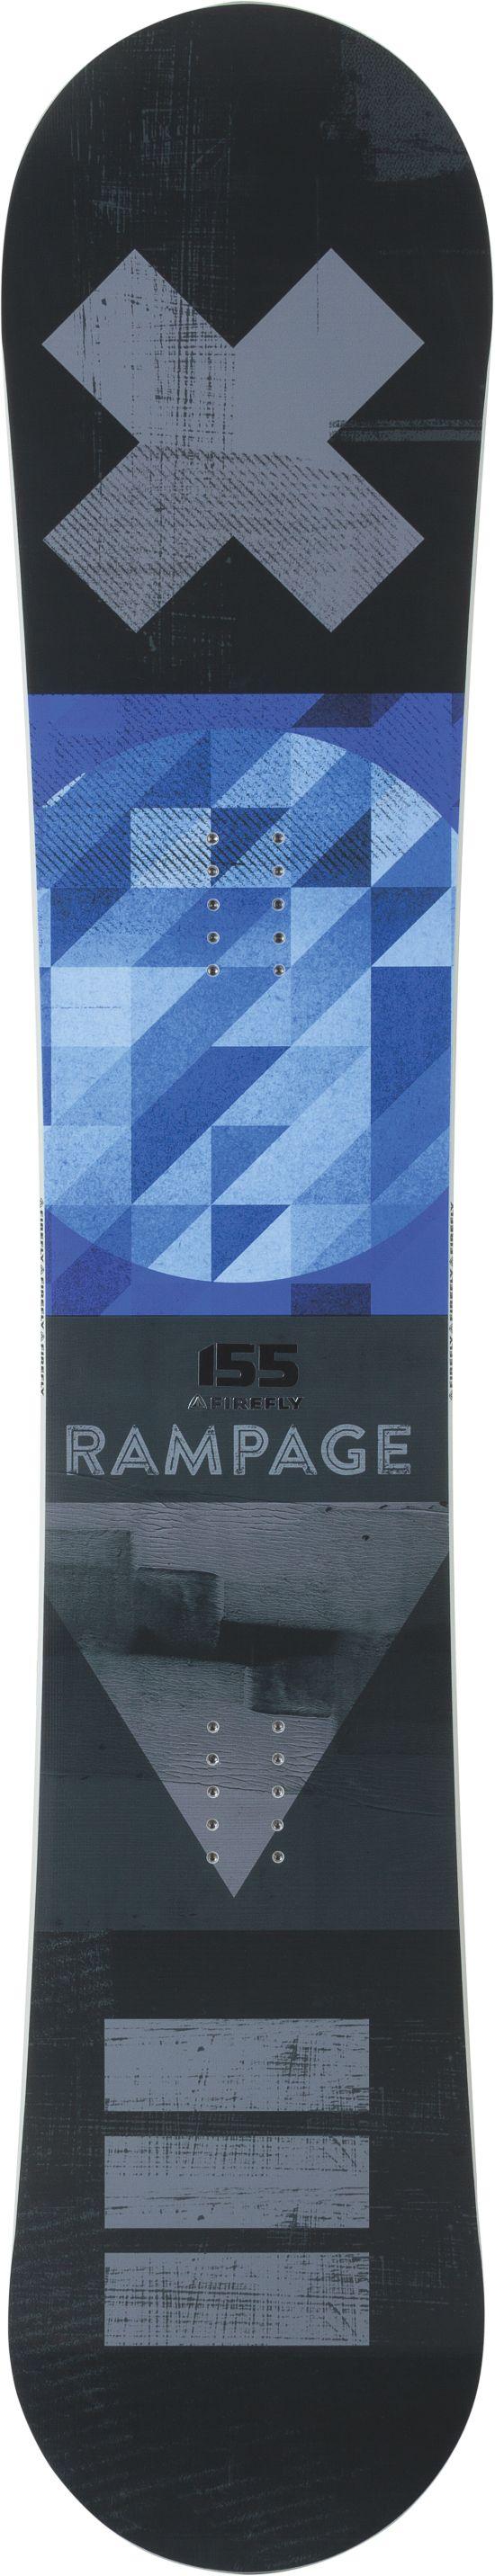 Rampage BLACK